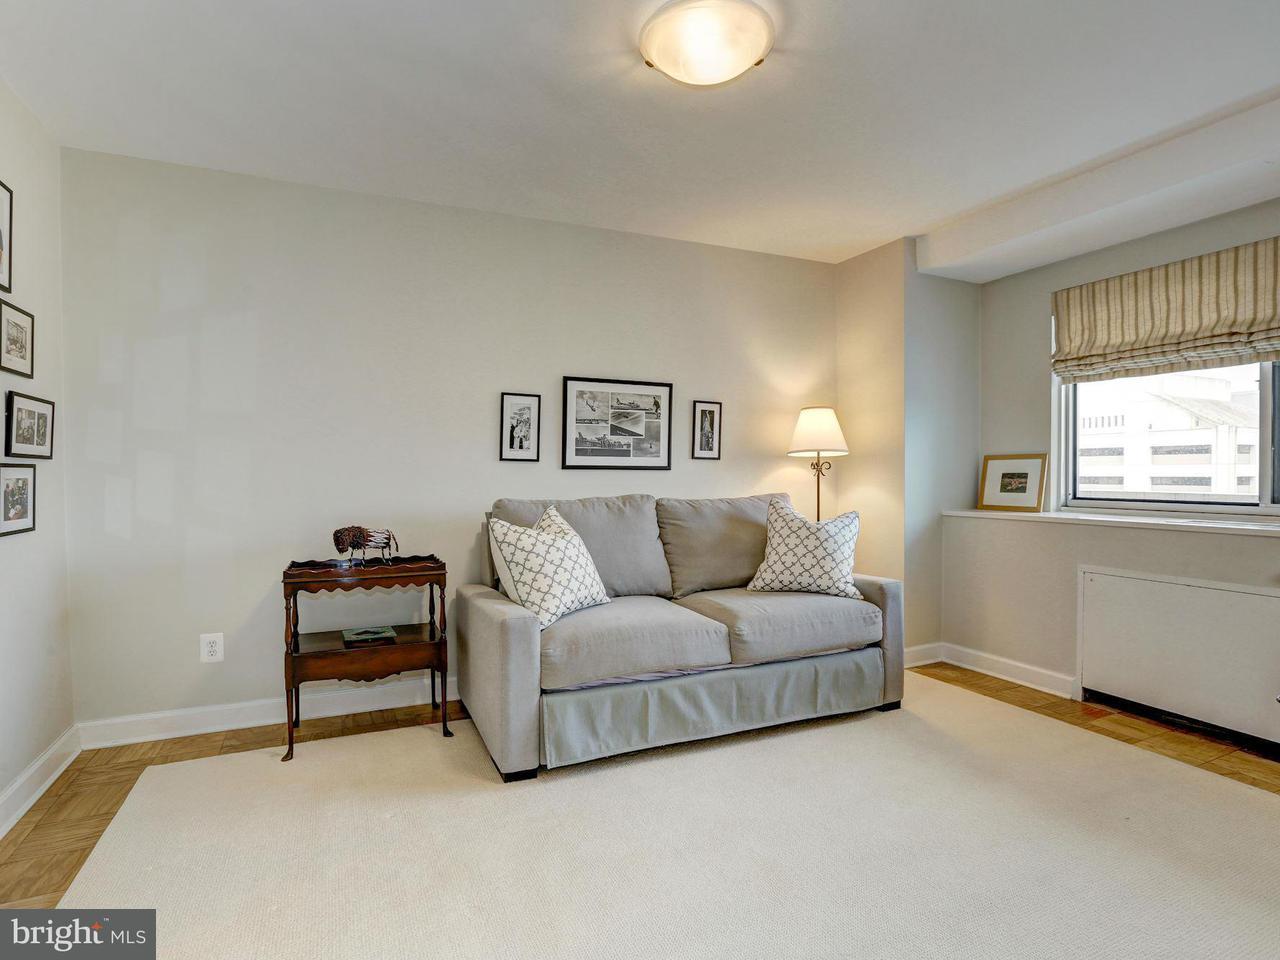 Additional photo for property listing at 730 24th St Nw #906/907 730 24th St Nw #906/907 Washington, Distrito De Columbia 20037 Estados Unidos